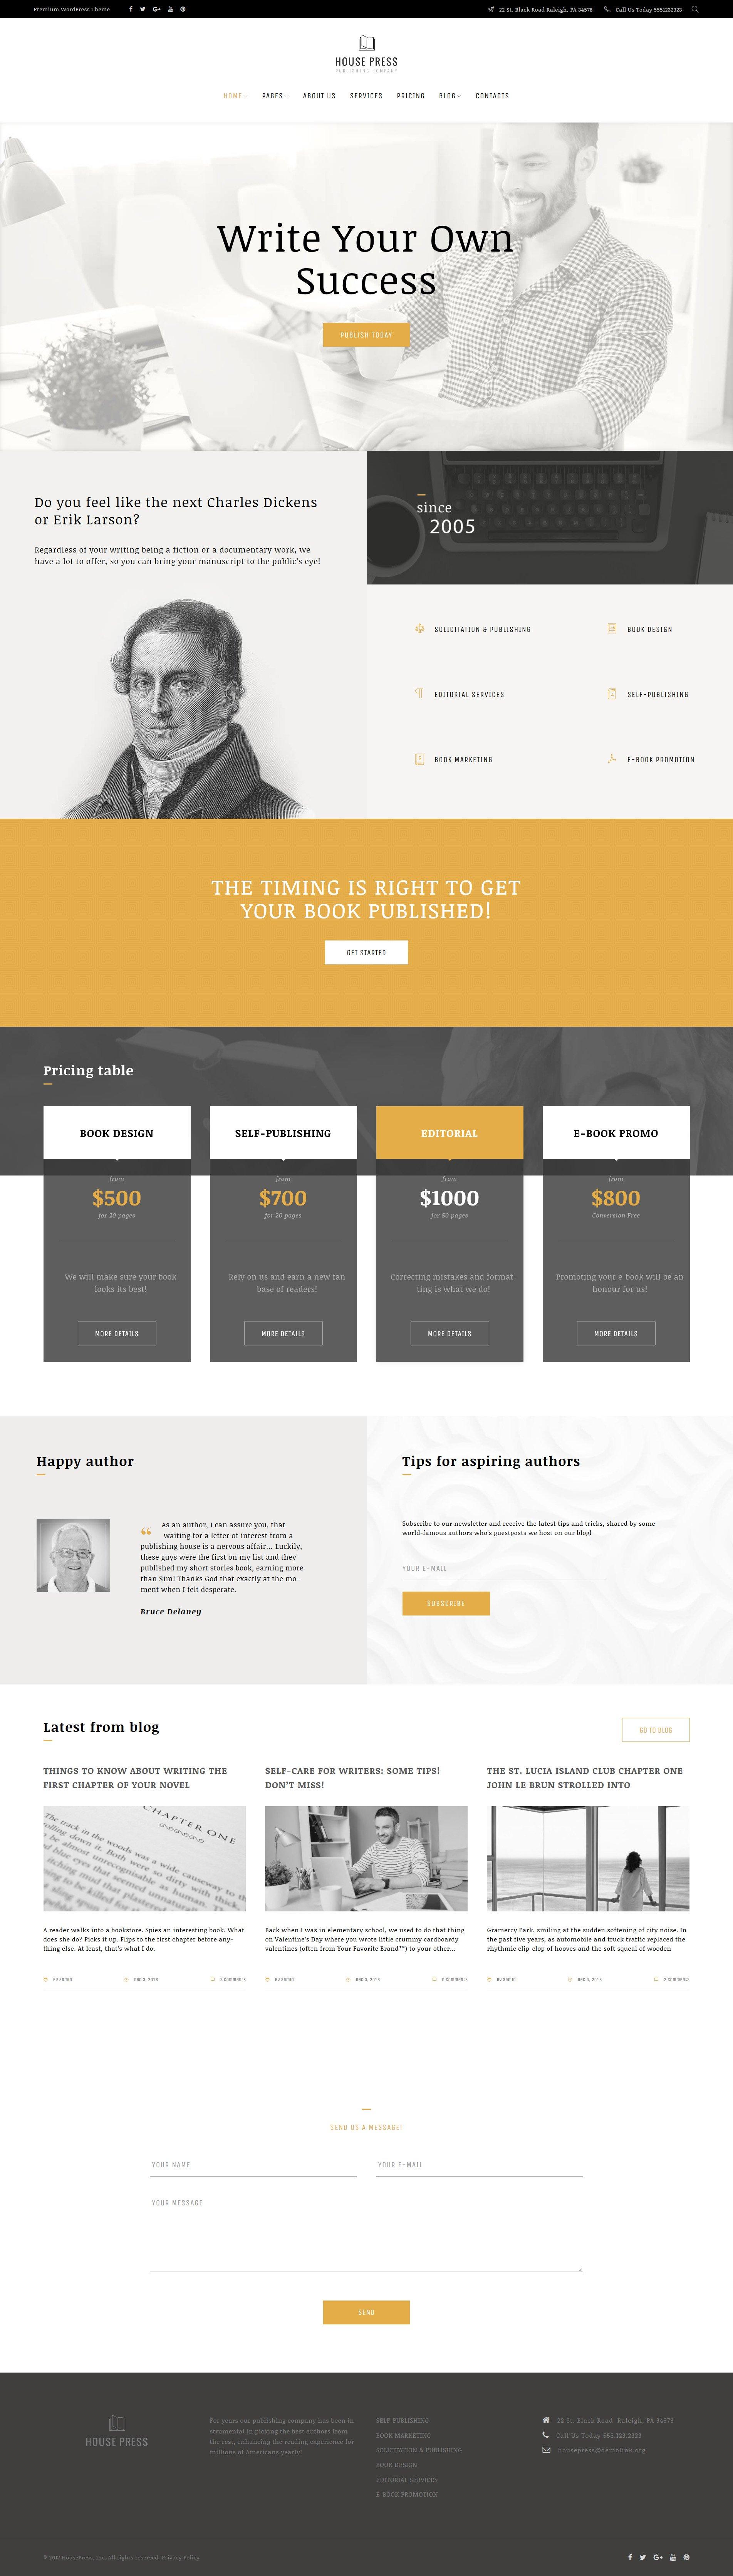 Responsive House Press - Publishing Company Wordpress #63528